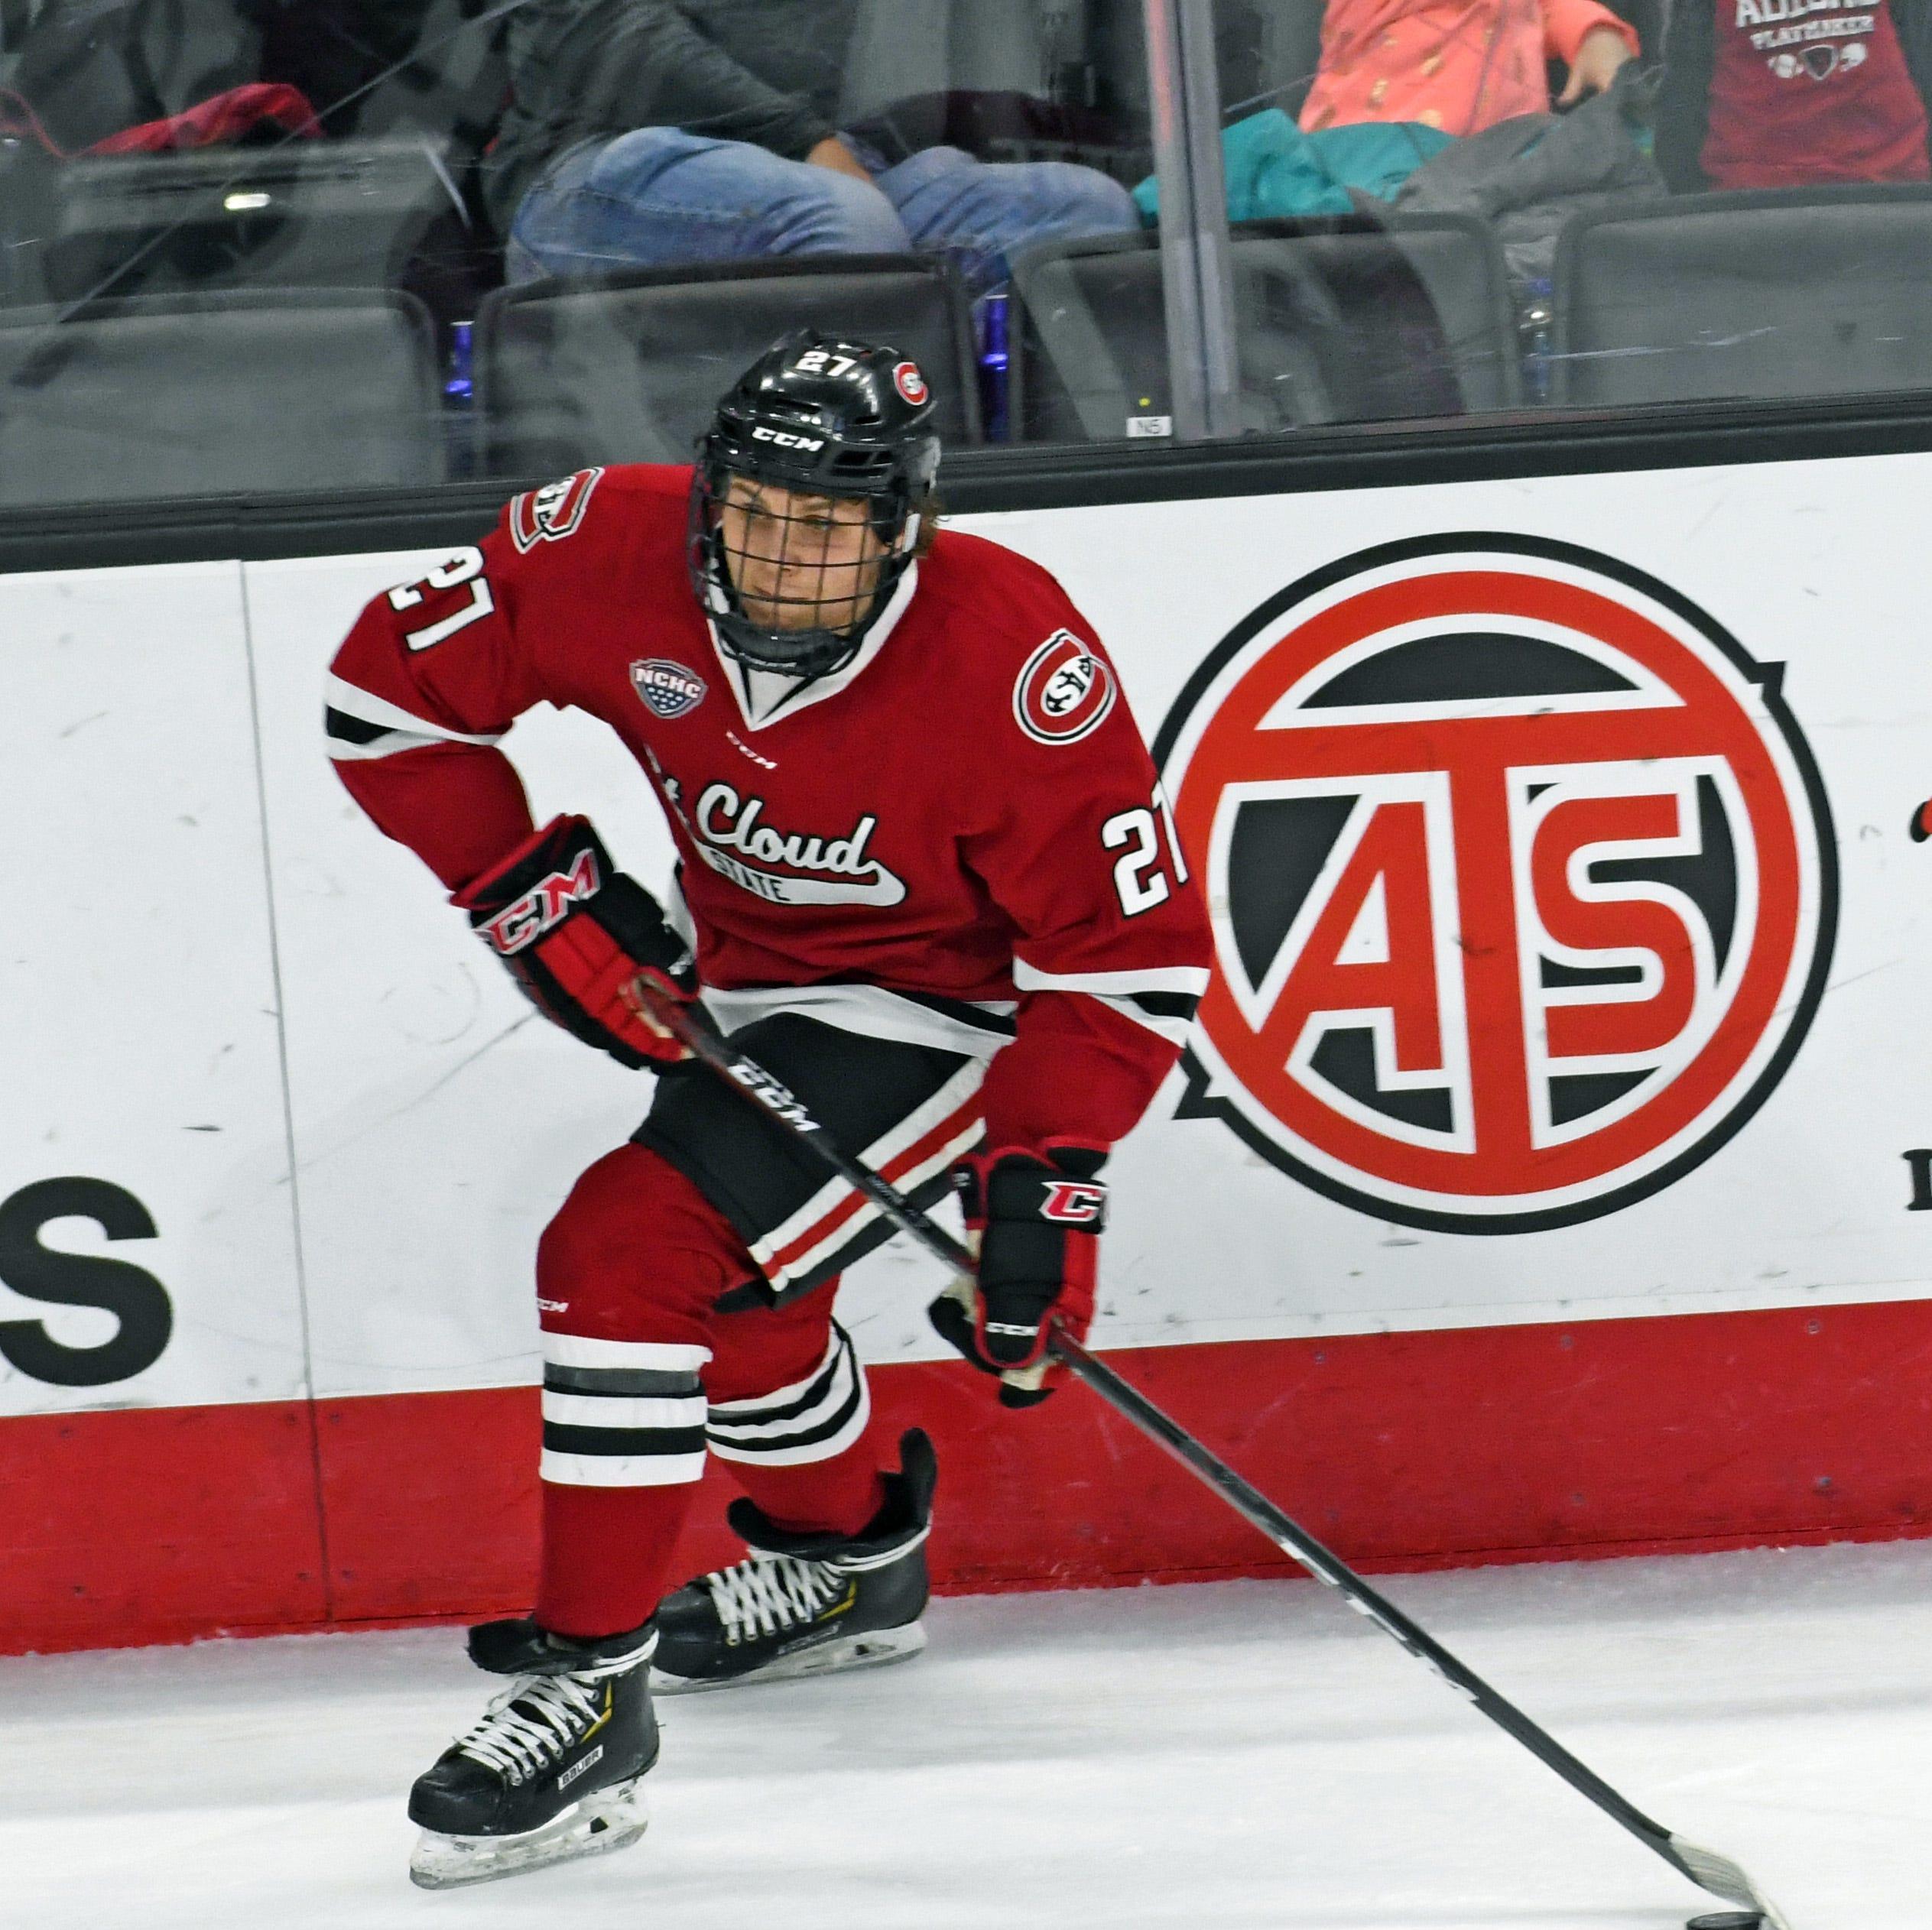 SCSU hockey players Blake Lizotte, Jacob Benson sign NHL deals